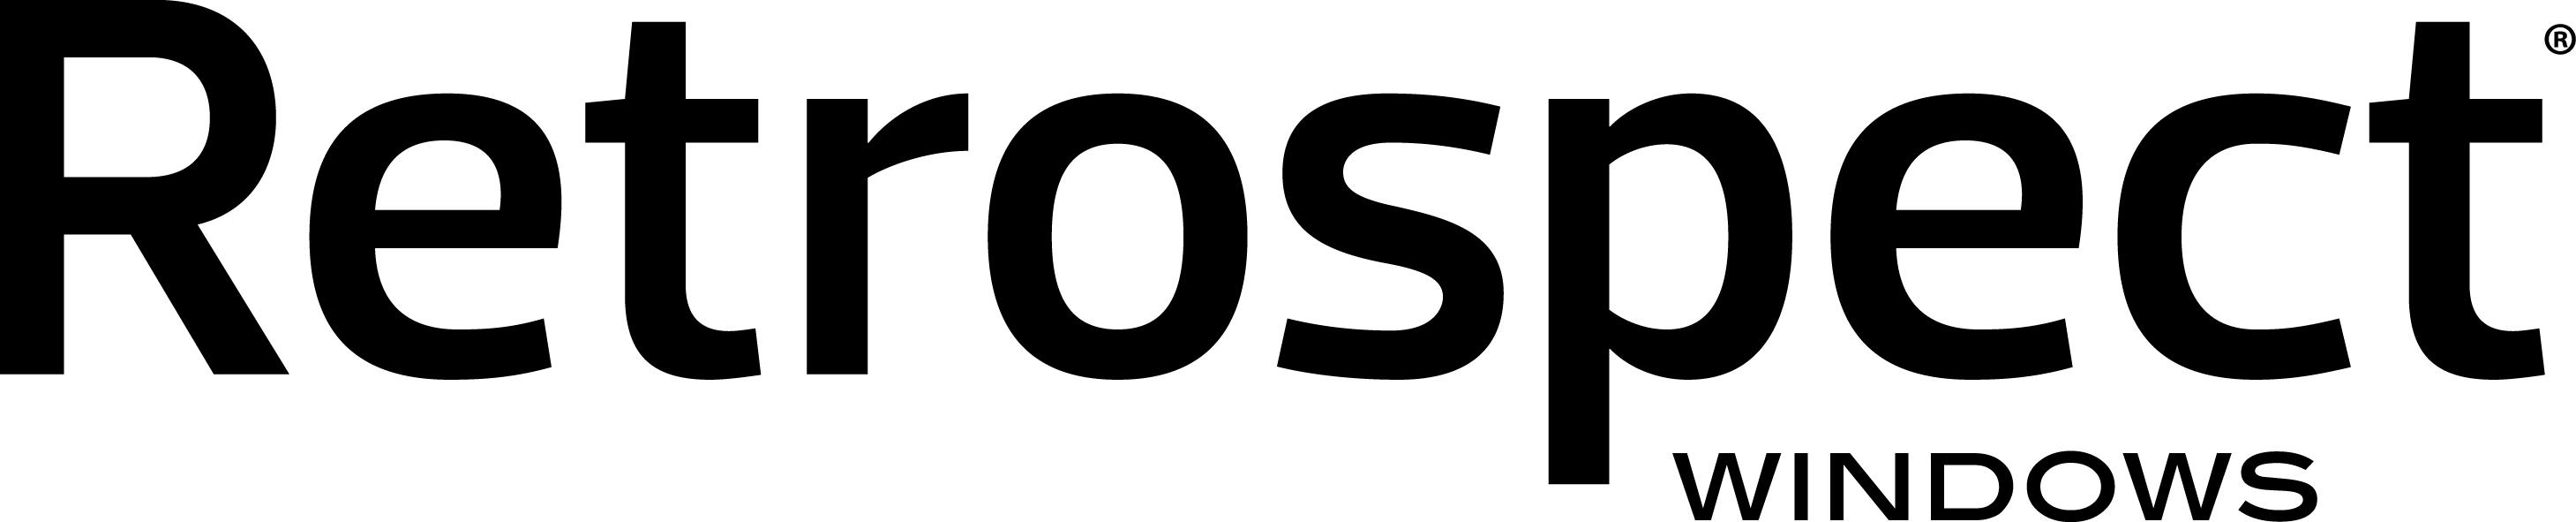 Retrospect product logo win